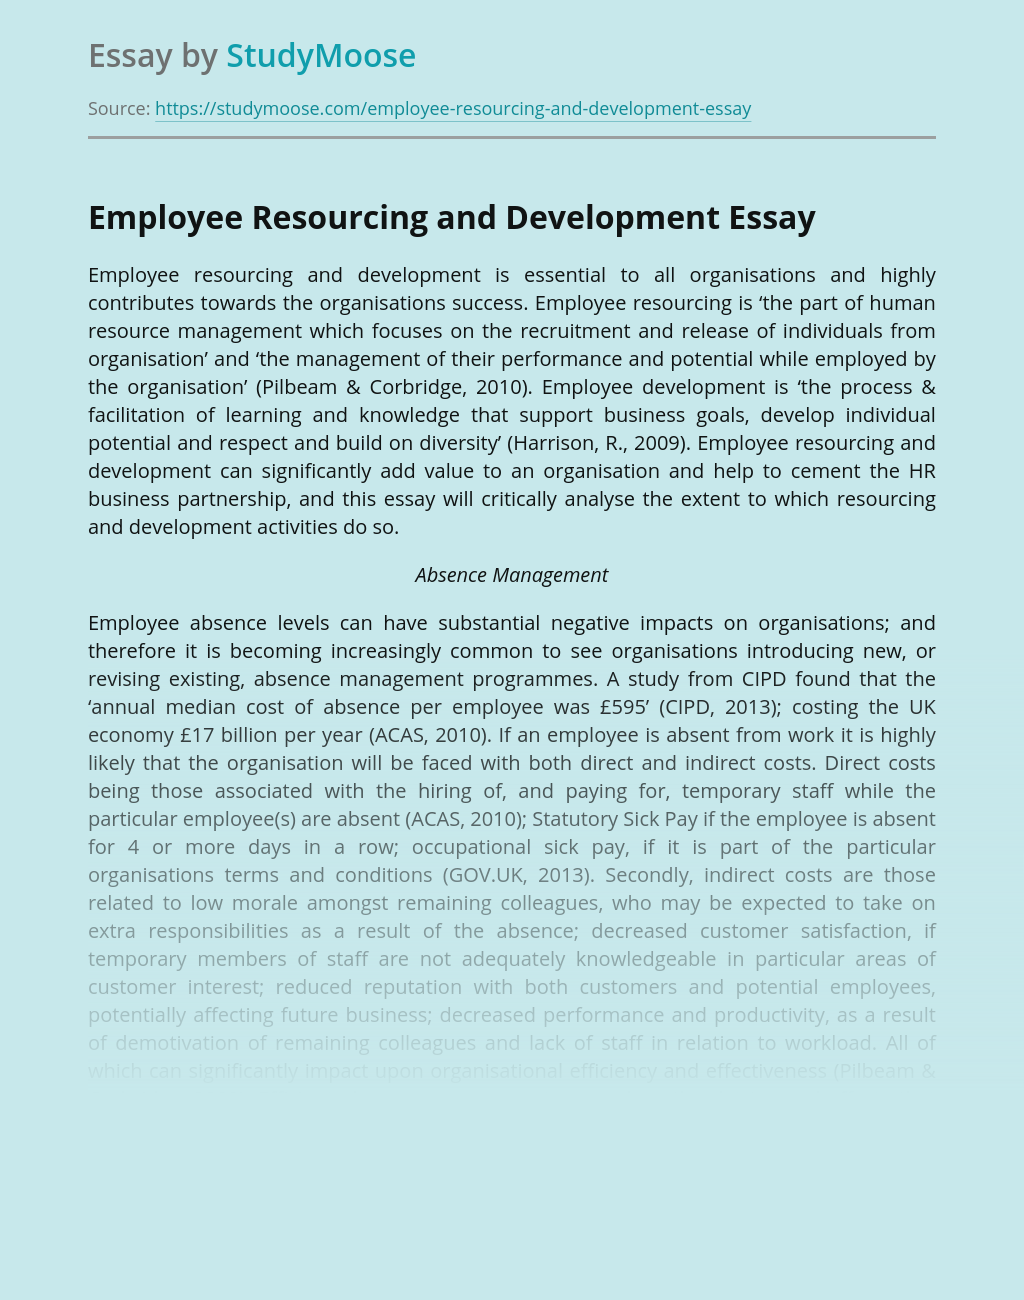 Employee Resourcing and Development